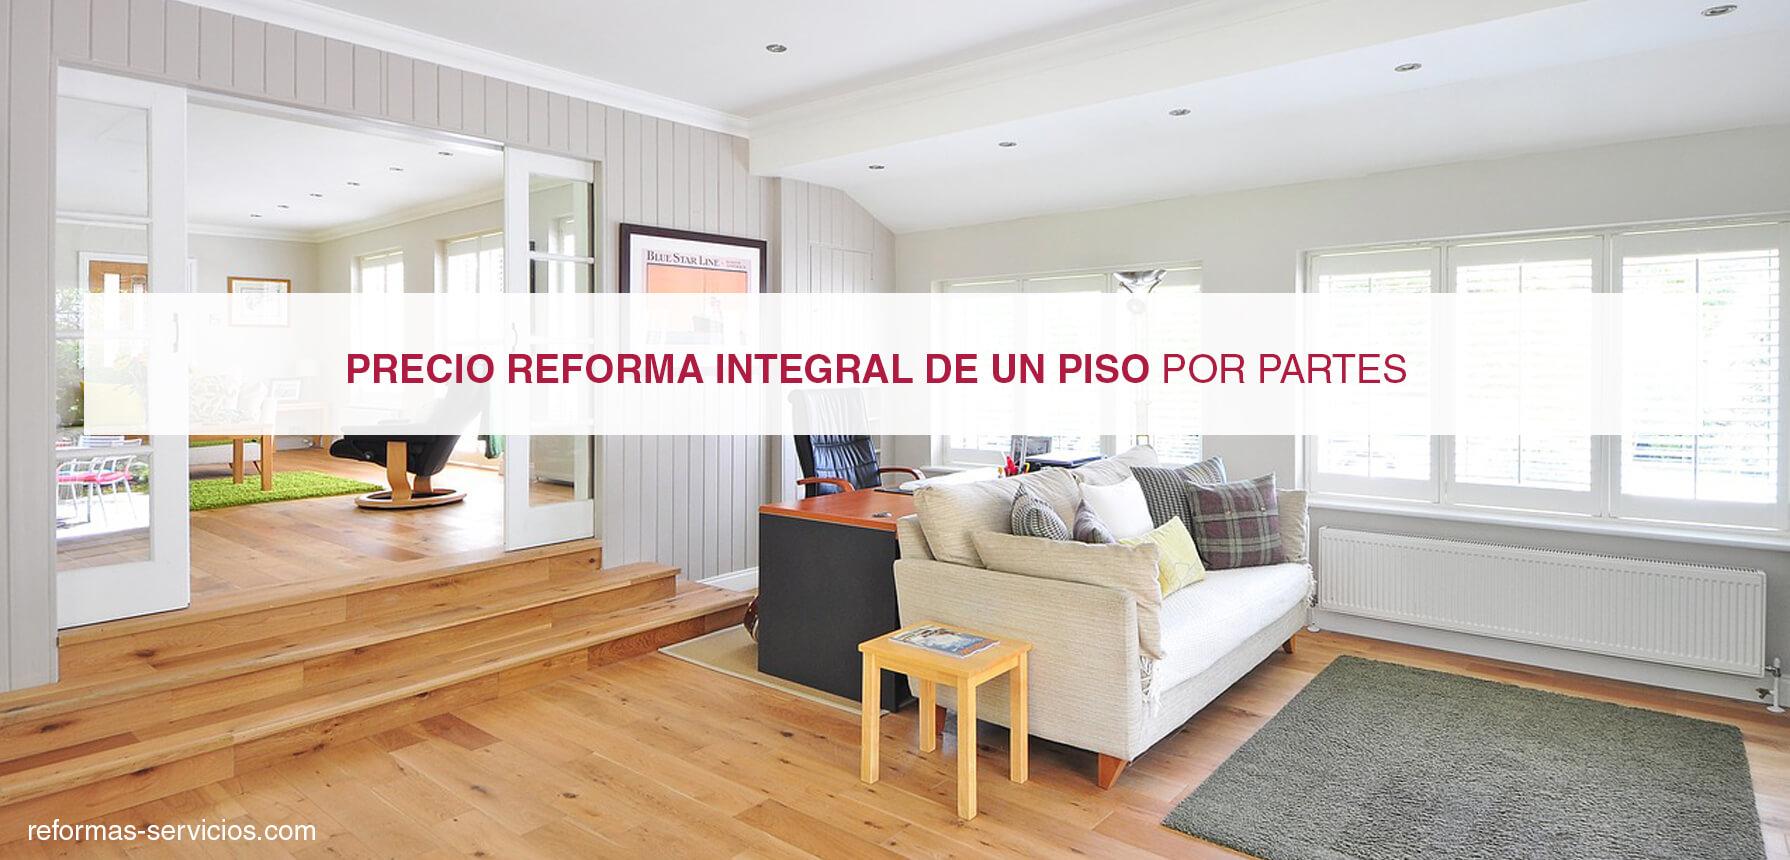 Reforma integral piso for Precio reforma integral casa